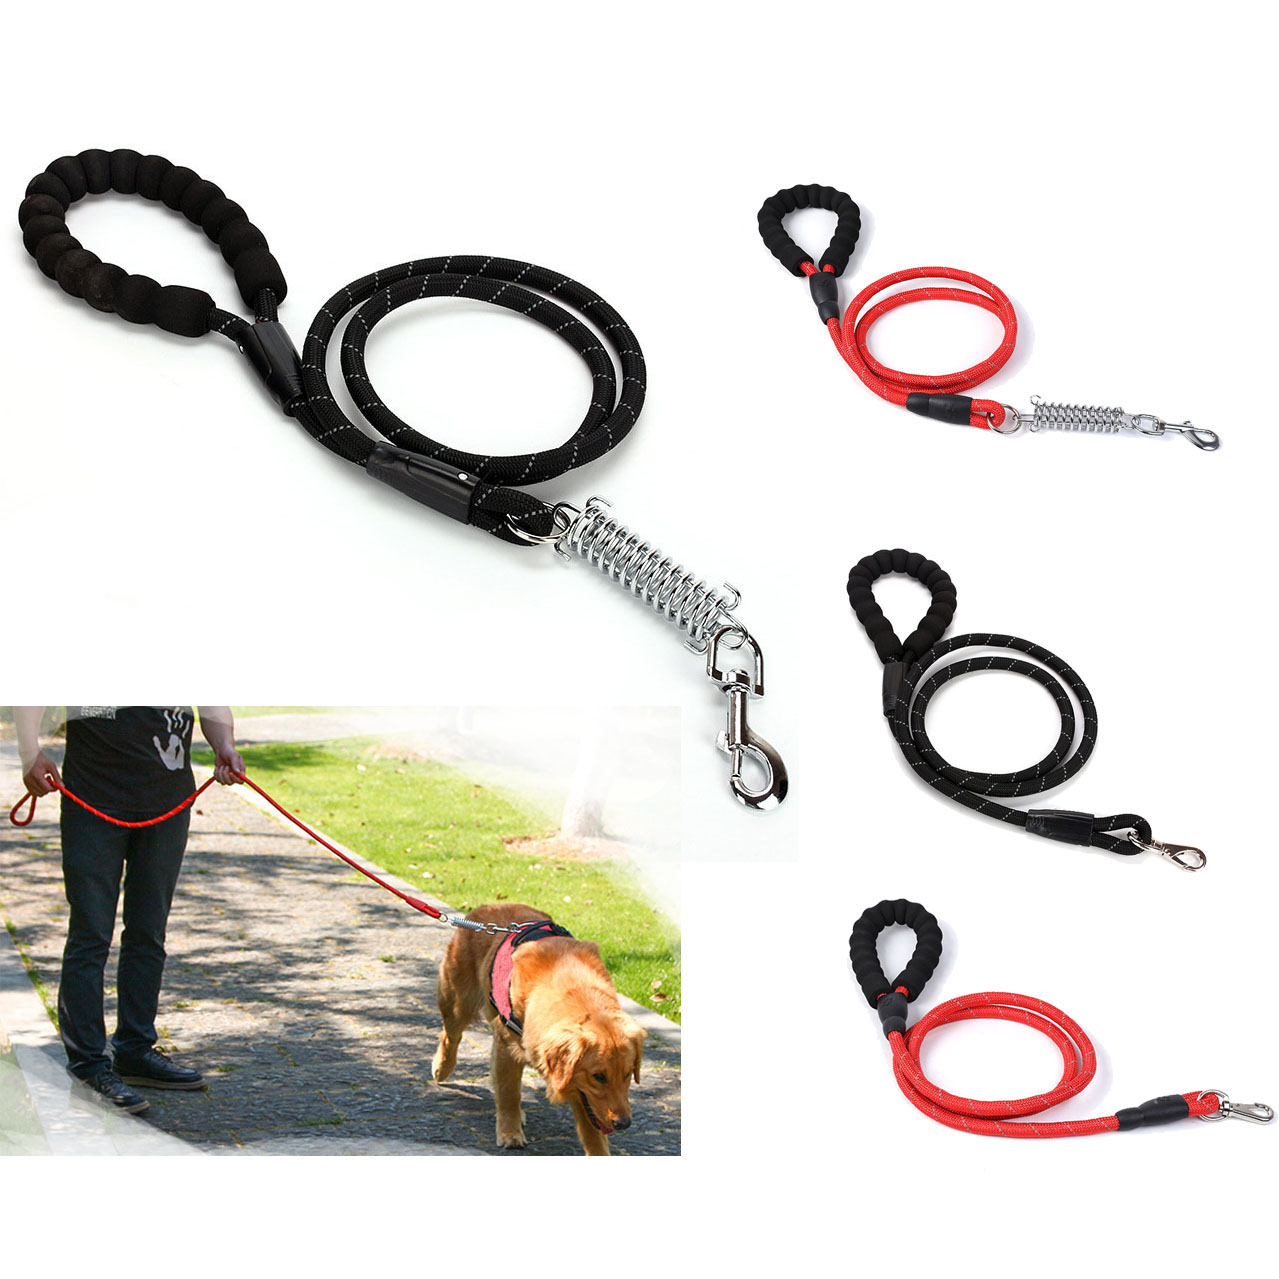 Dog Leash for Pet Cat Dog 6 FT Long Dog Puppy Nylon Leash Lead High Quality